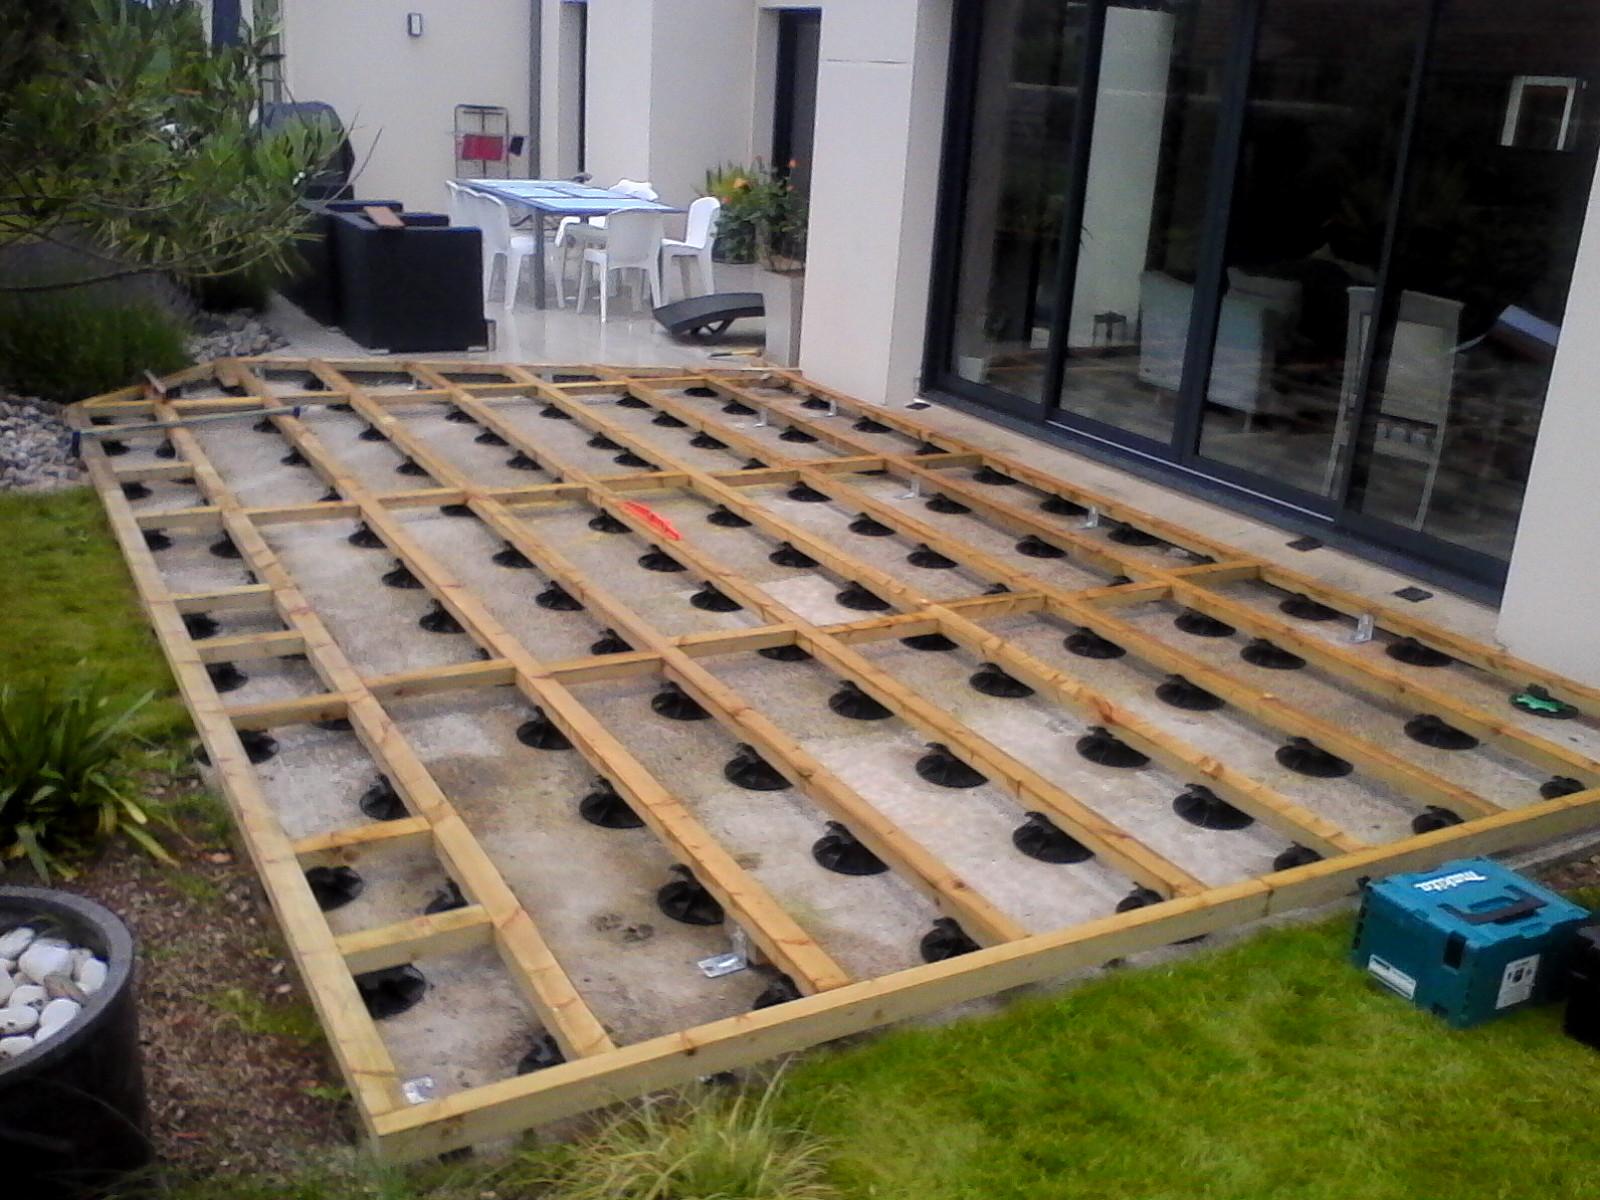 Construction terrasse bois sur plot Mailleraye jardin